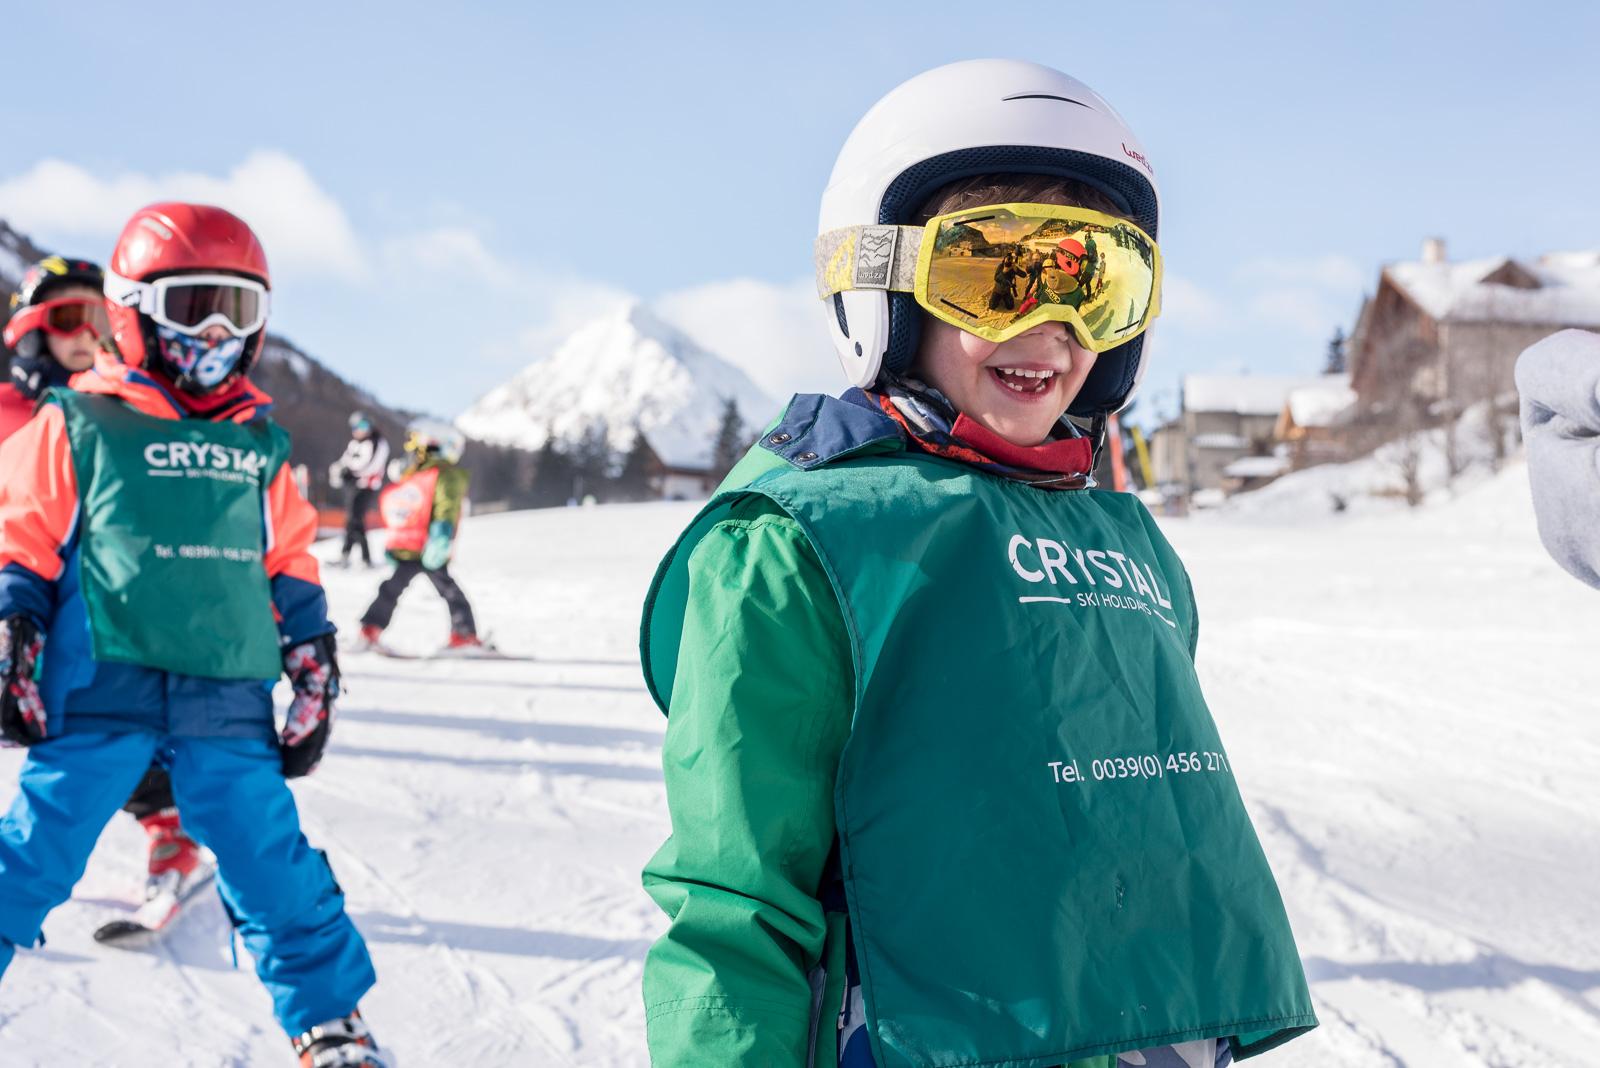 Crystal Ski Whizz Kids and Pepi Penguin